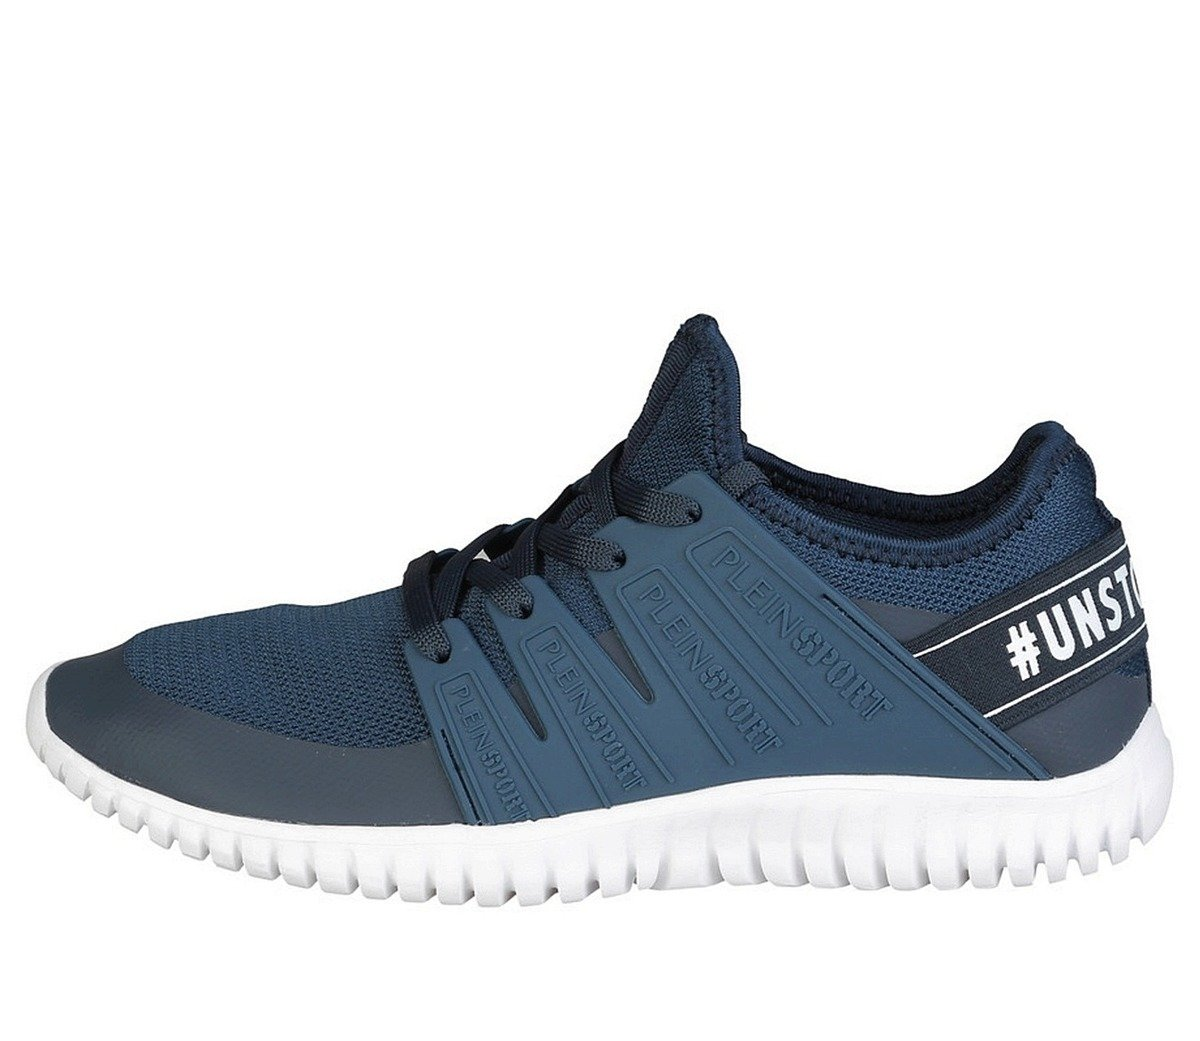 best sneakers ce570 48aef PLEIN SPORT Runner